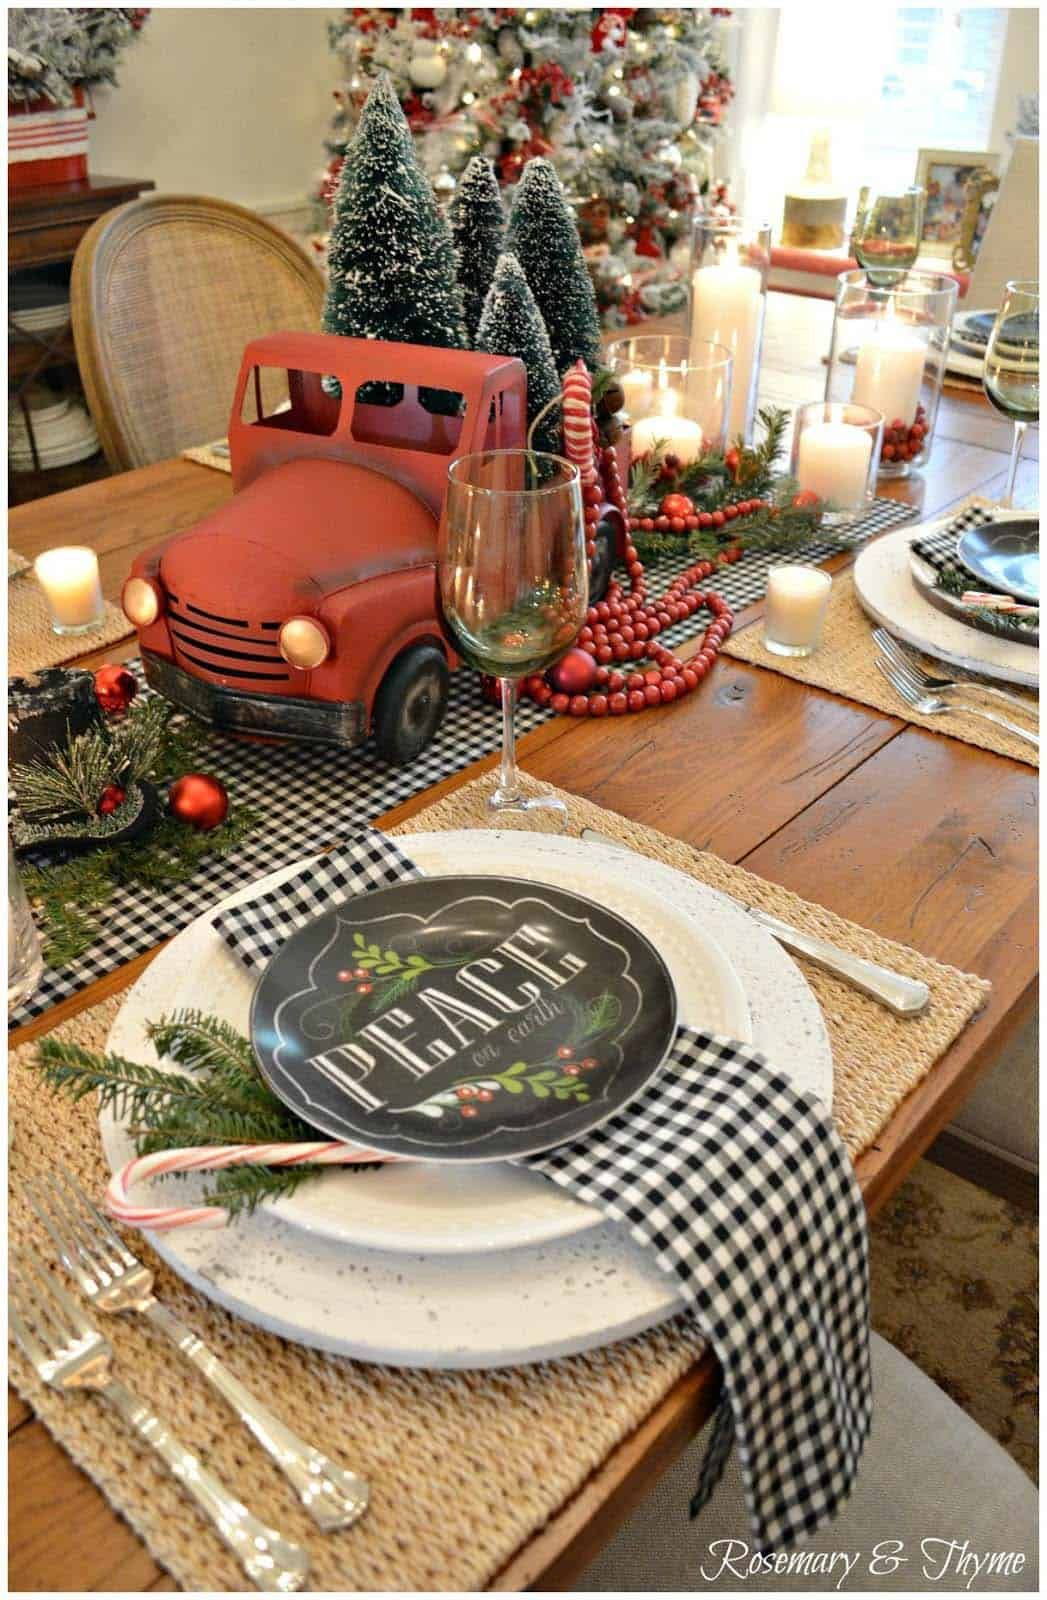 25 Absolutely Gorgeous Centerpiece Ideas For Your Christmas Table Plaid Christmas Decor Christmas Table Settings Christmas Decorations Cheap